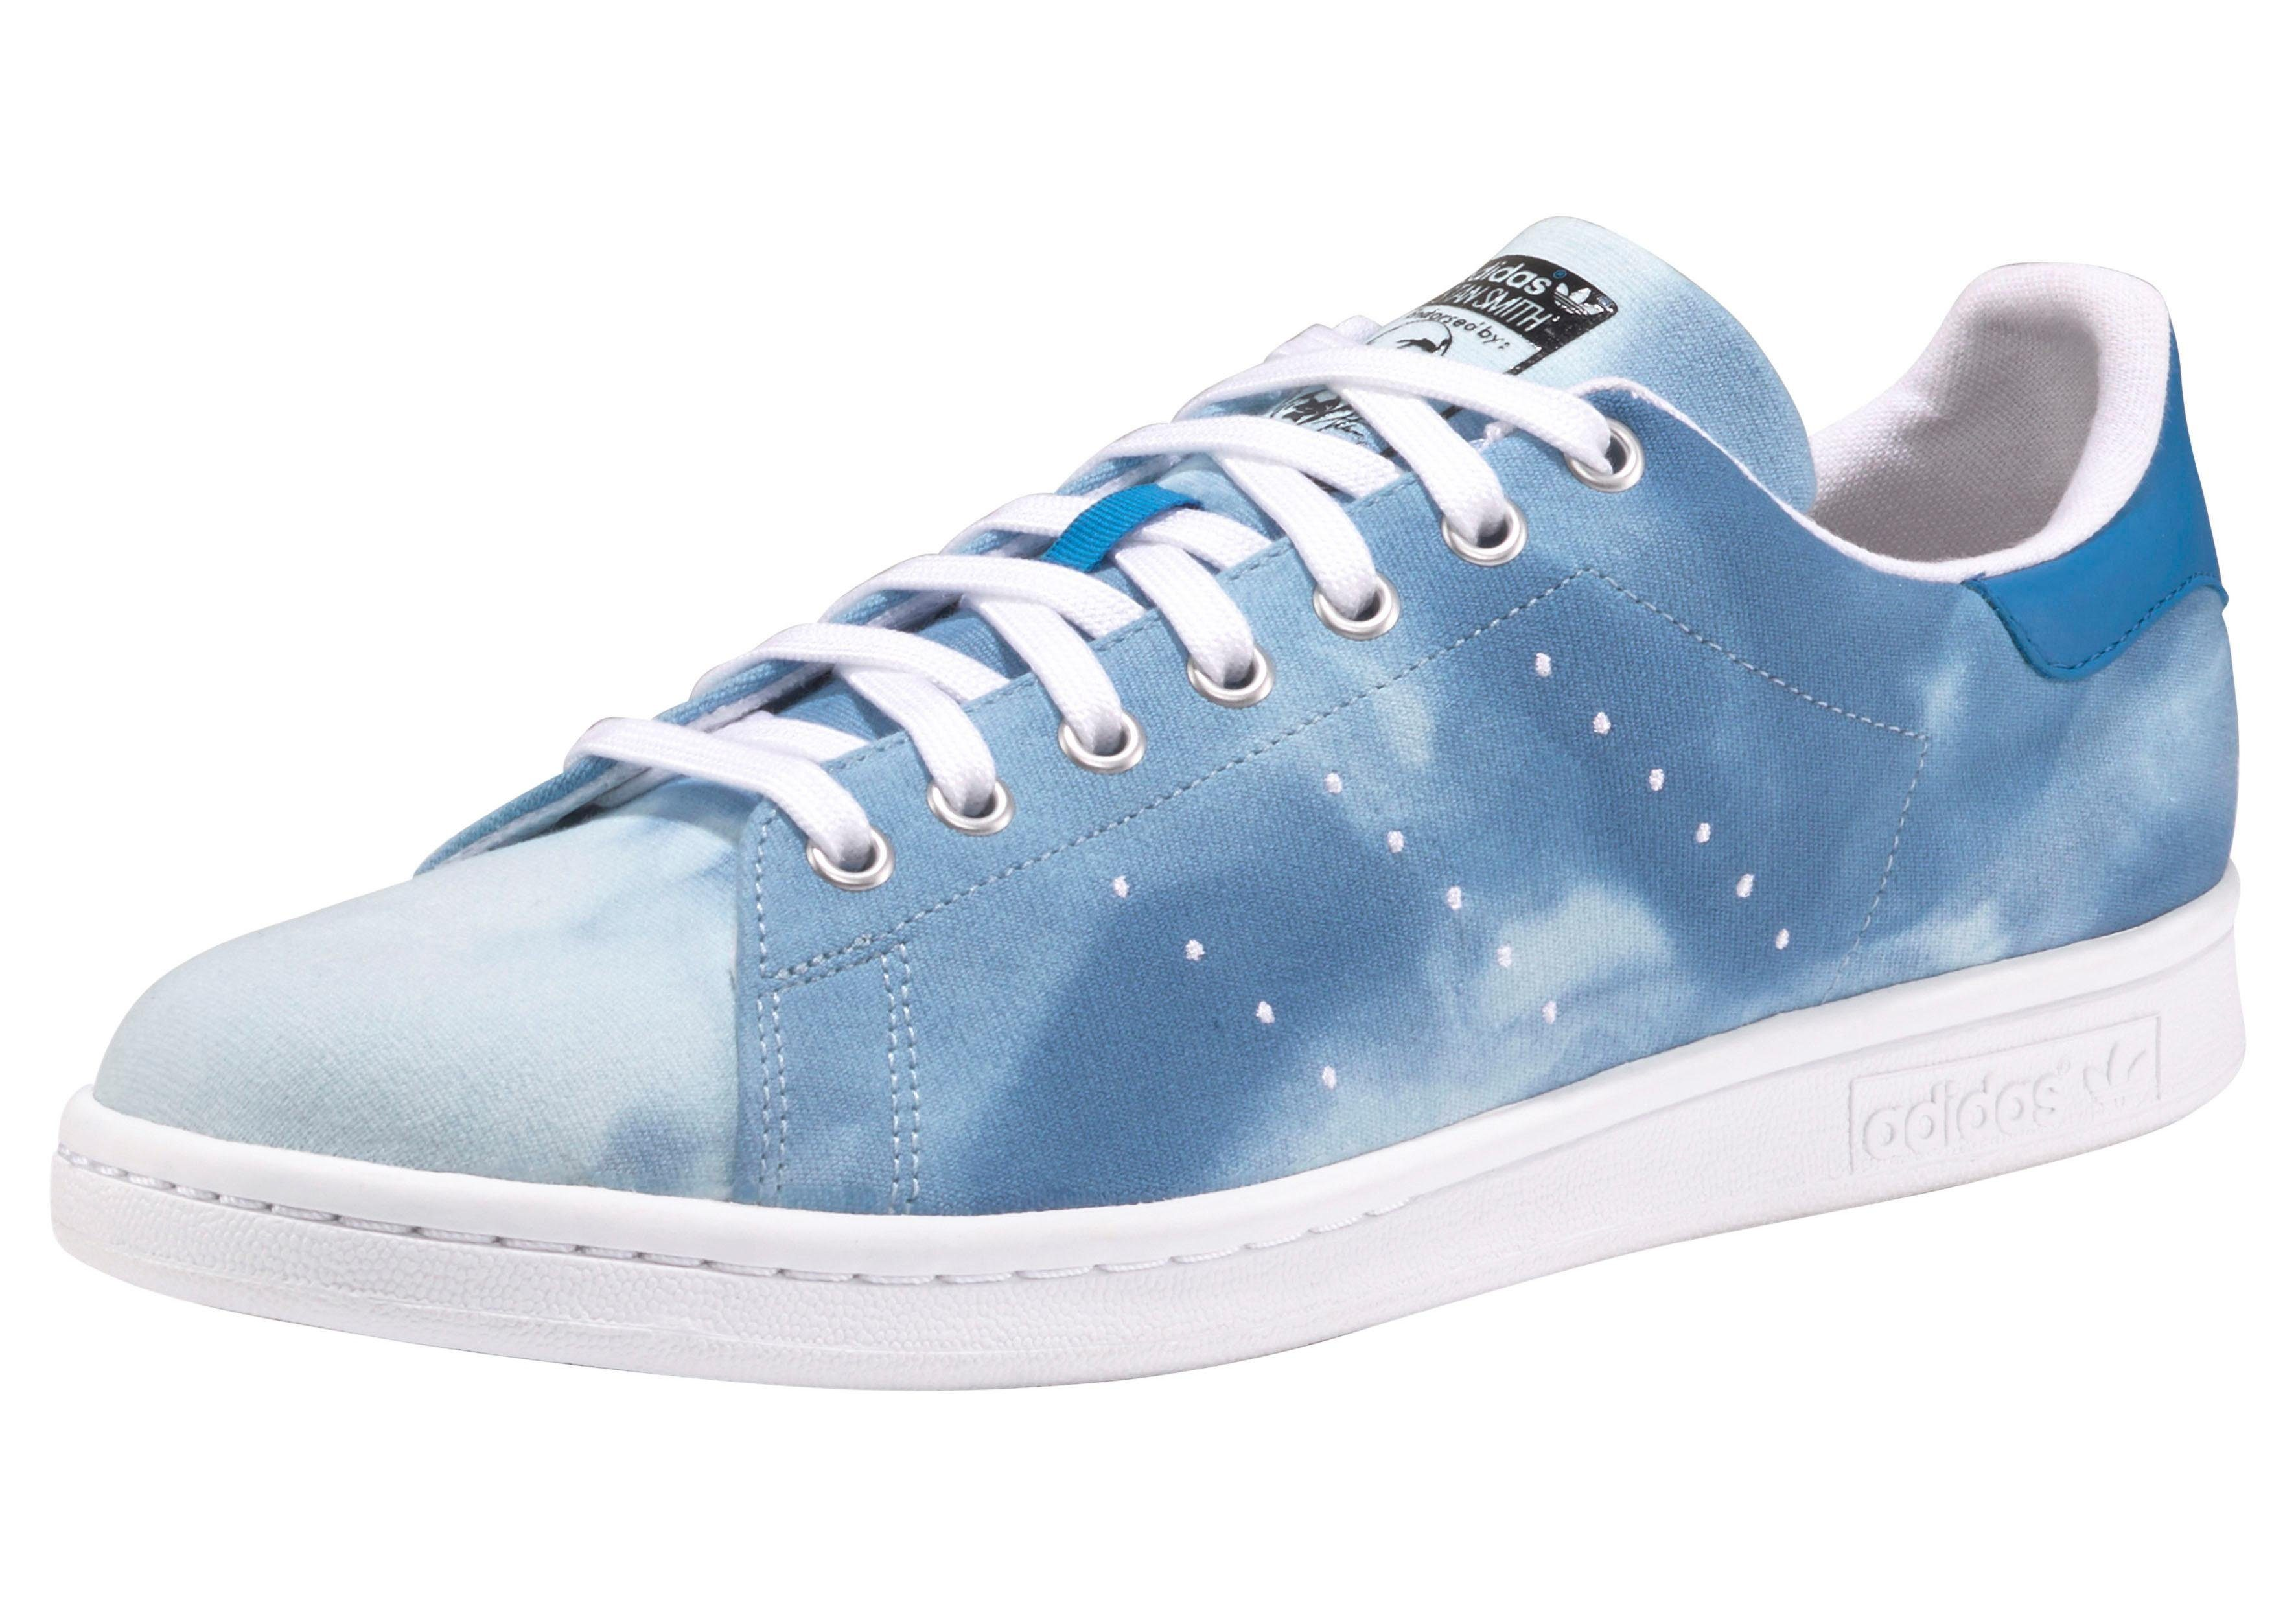 adidas Originals »PW HU Holi Stan Smith Unisex« Sneaker Pharrell Williams online kaufen | OTTO